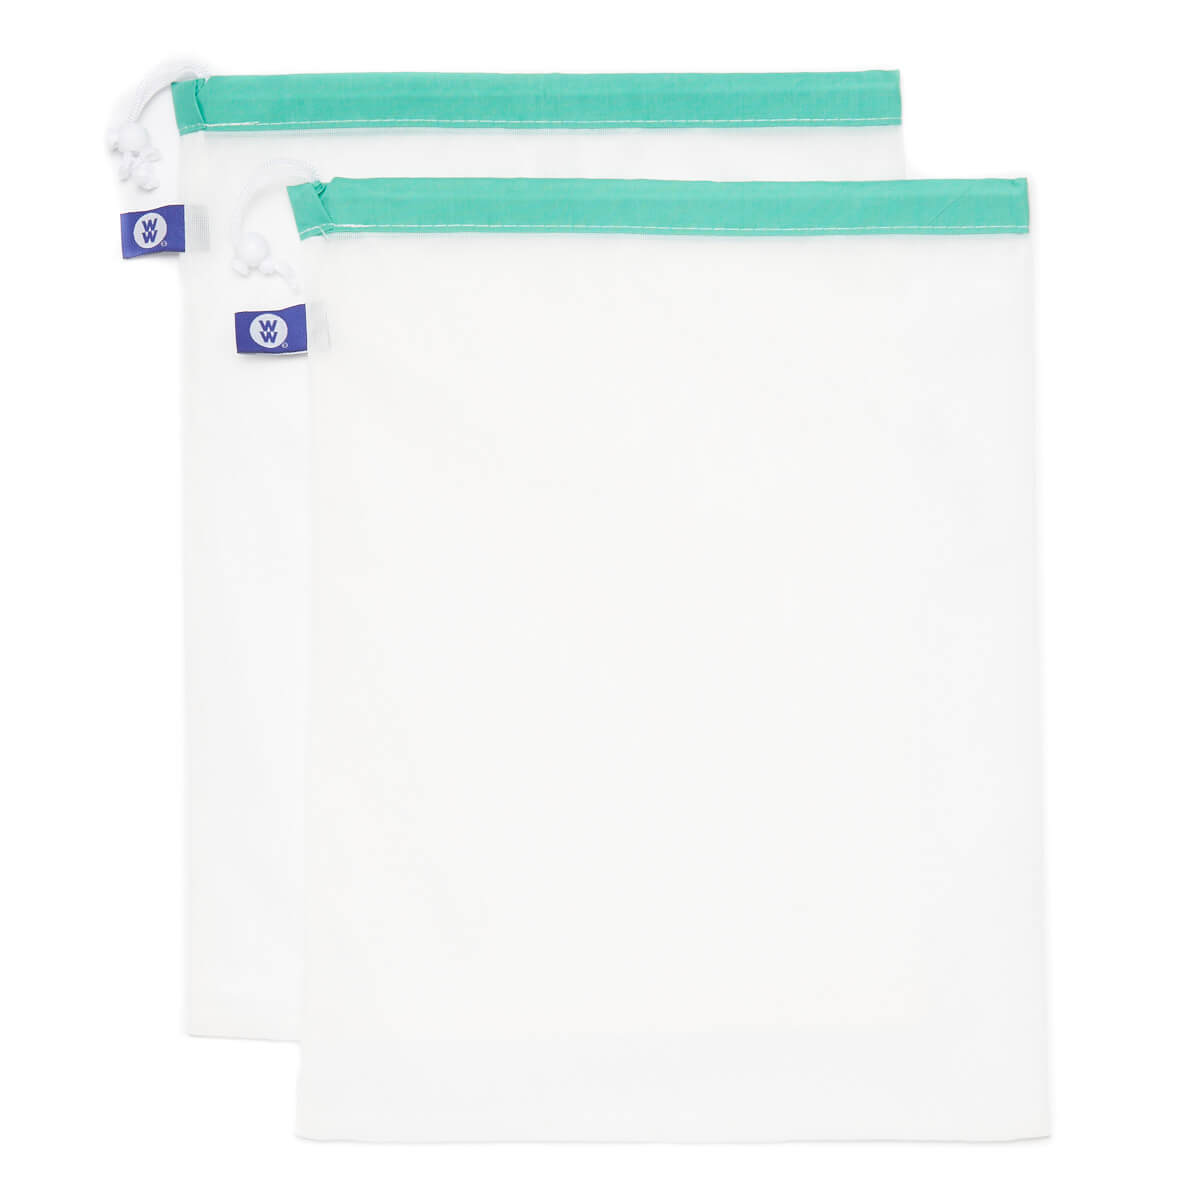 WW Reusable Produce Bags - large